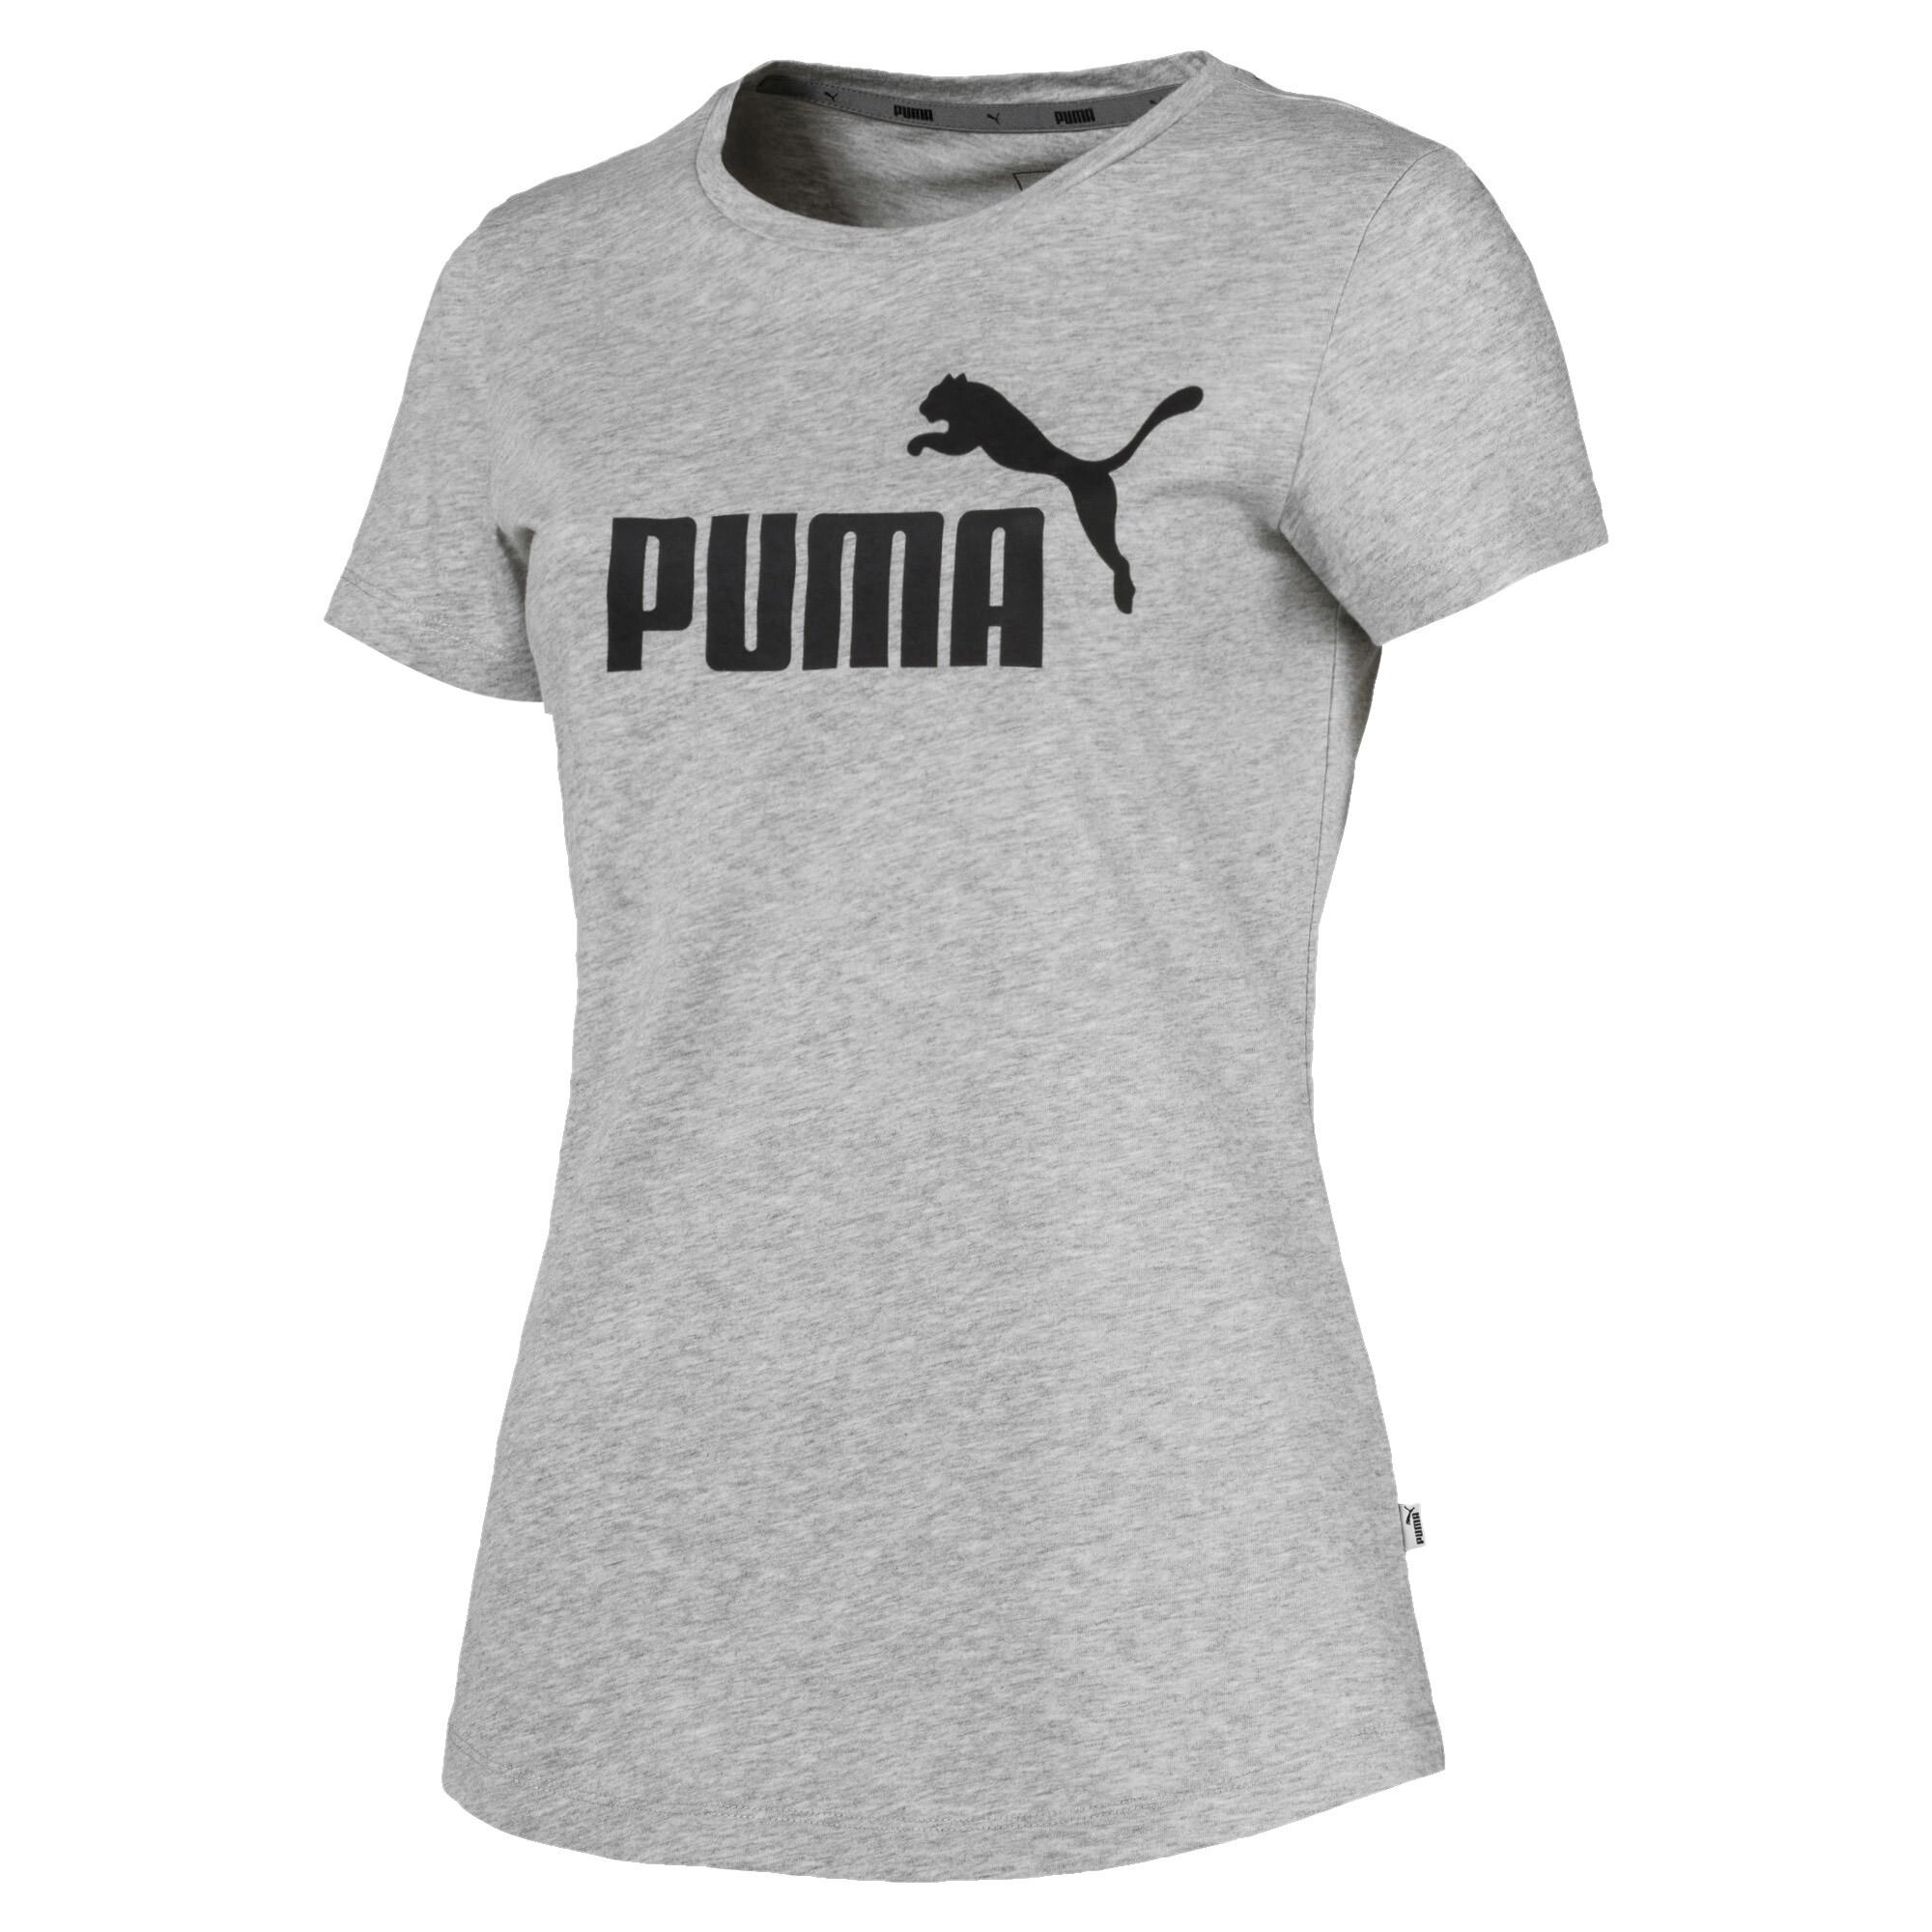 Polera deportiva Essentials para mujer